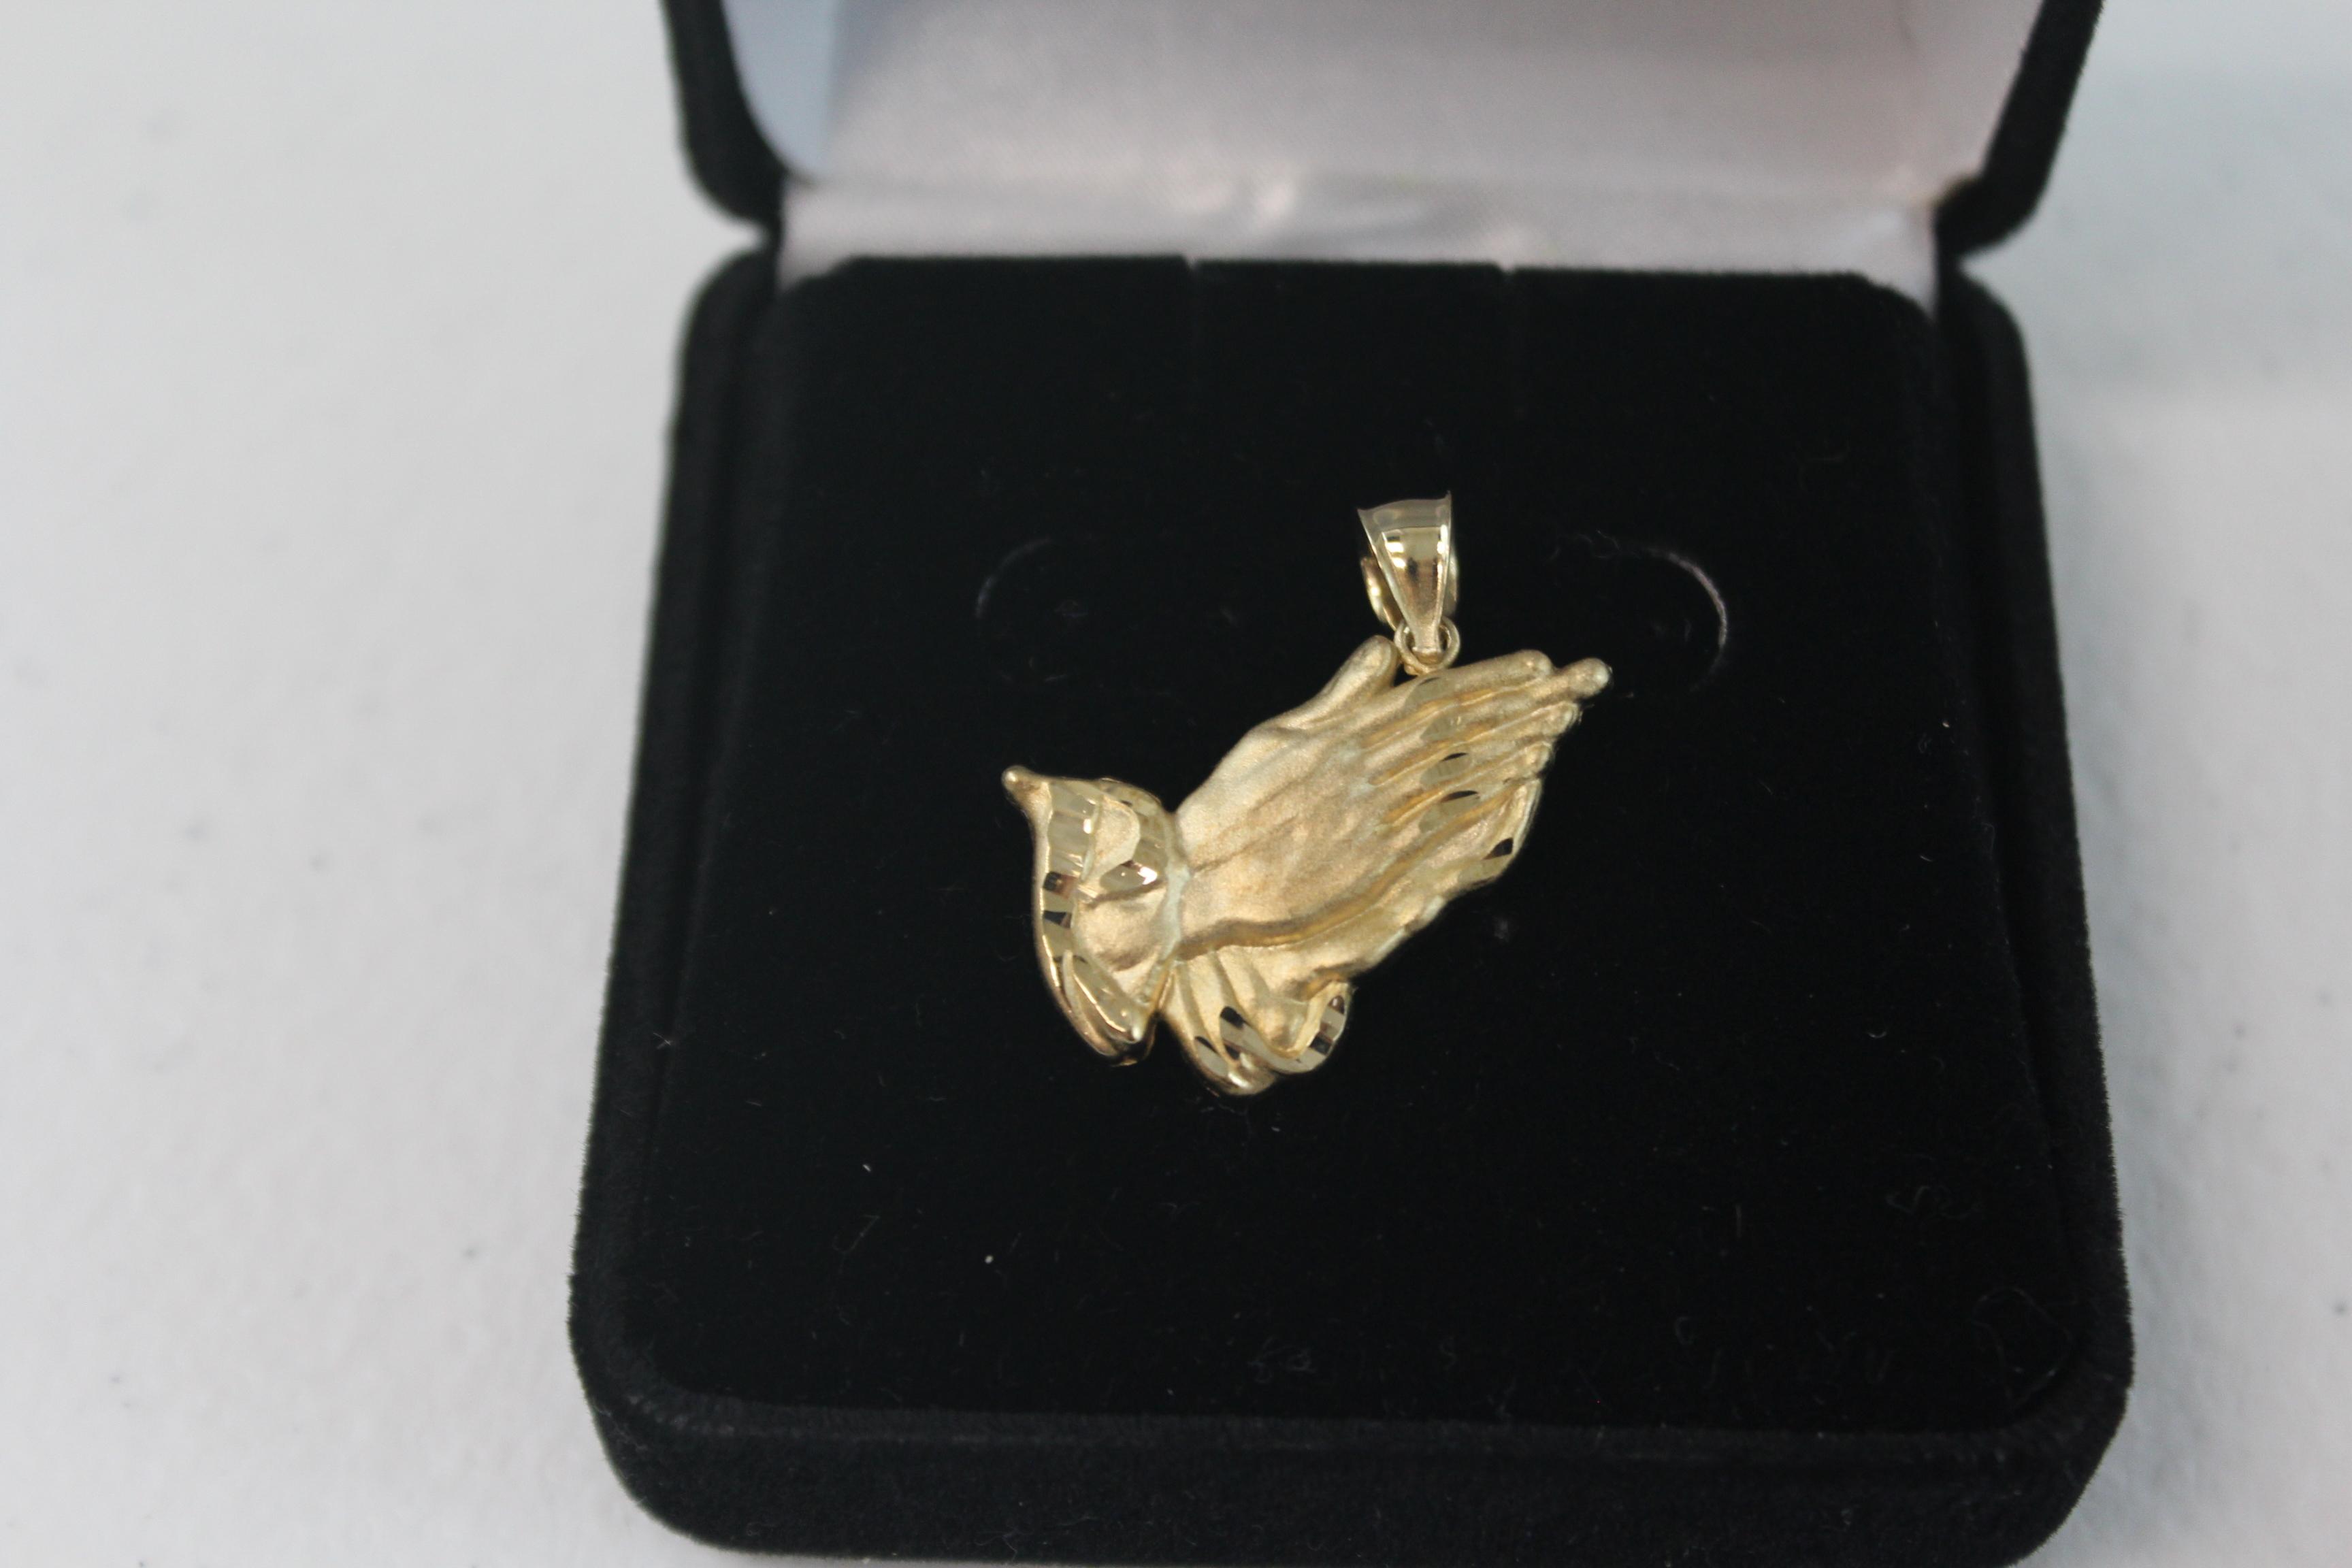 10K Yellow Gold Praying Hands Pendant/Charm